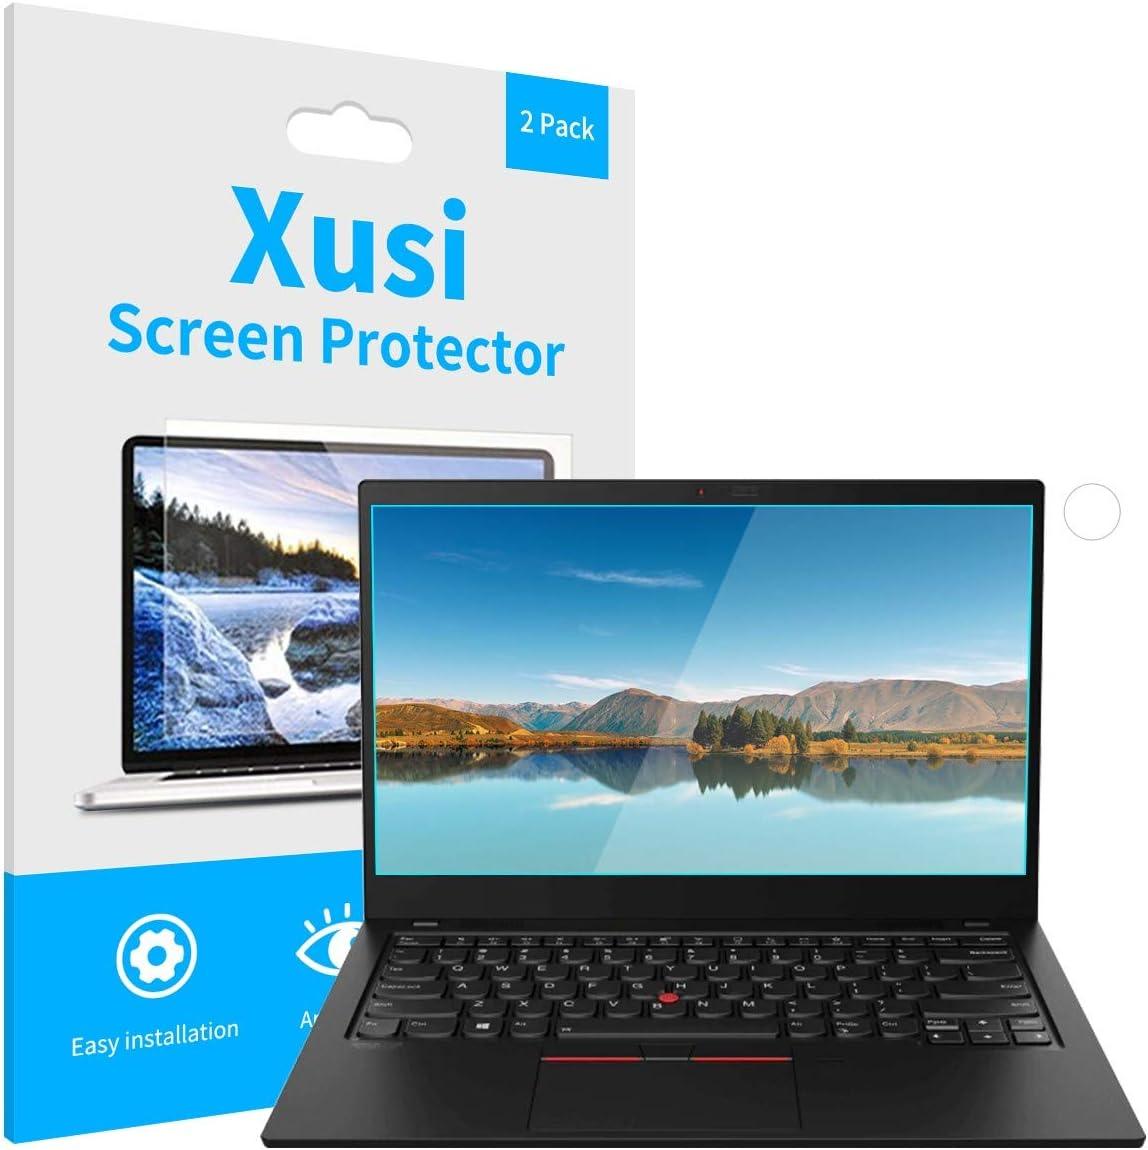 Xusi Screen Protector For Lenovo Thinkpad X1 Carbon Gen8/Gen7/Gen6 Anti Bluelight &Anti Glare Screen Protector Precise Film 14 Inch 2Pcs (14 In Anti Bluelight, Transparent)